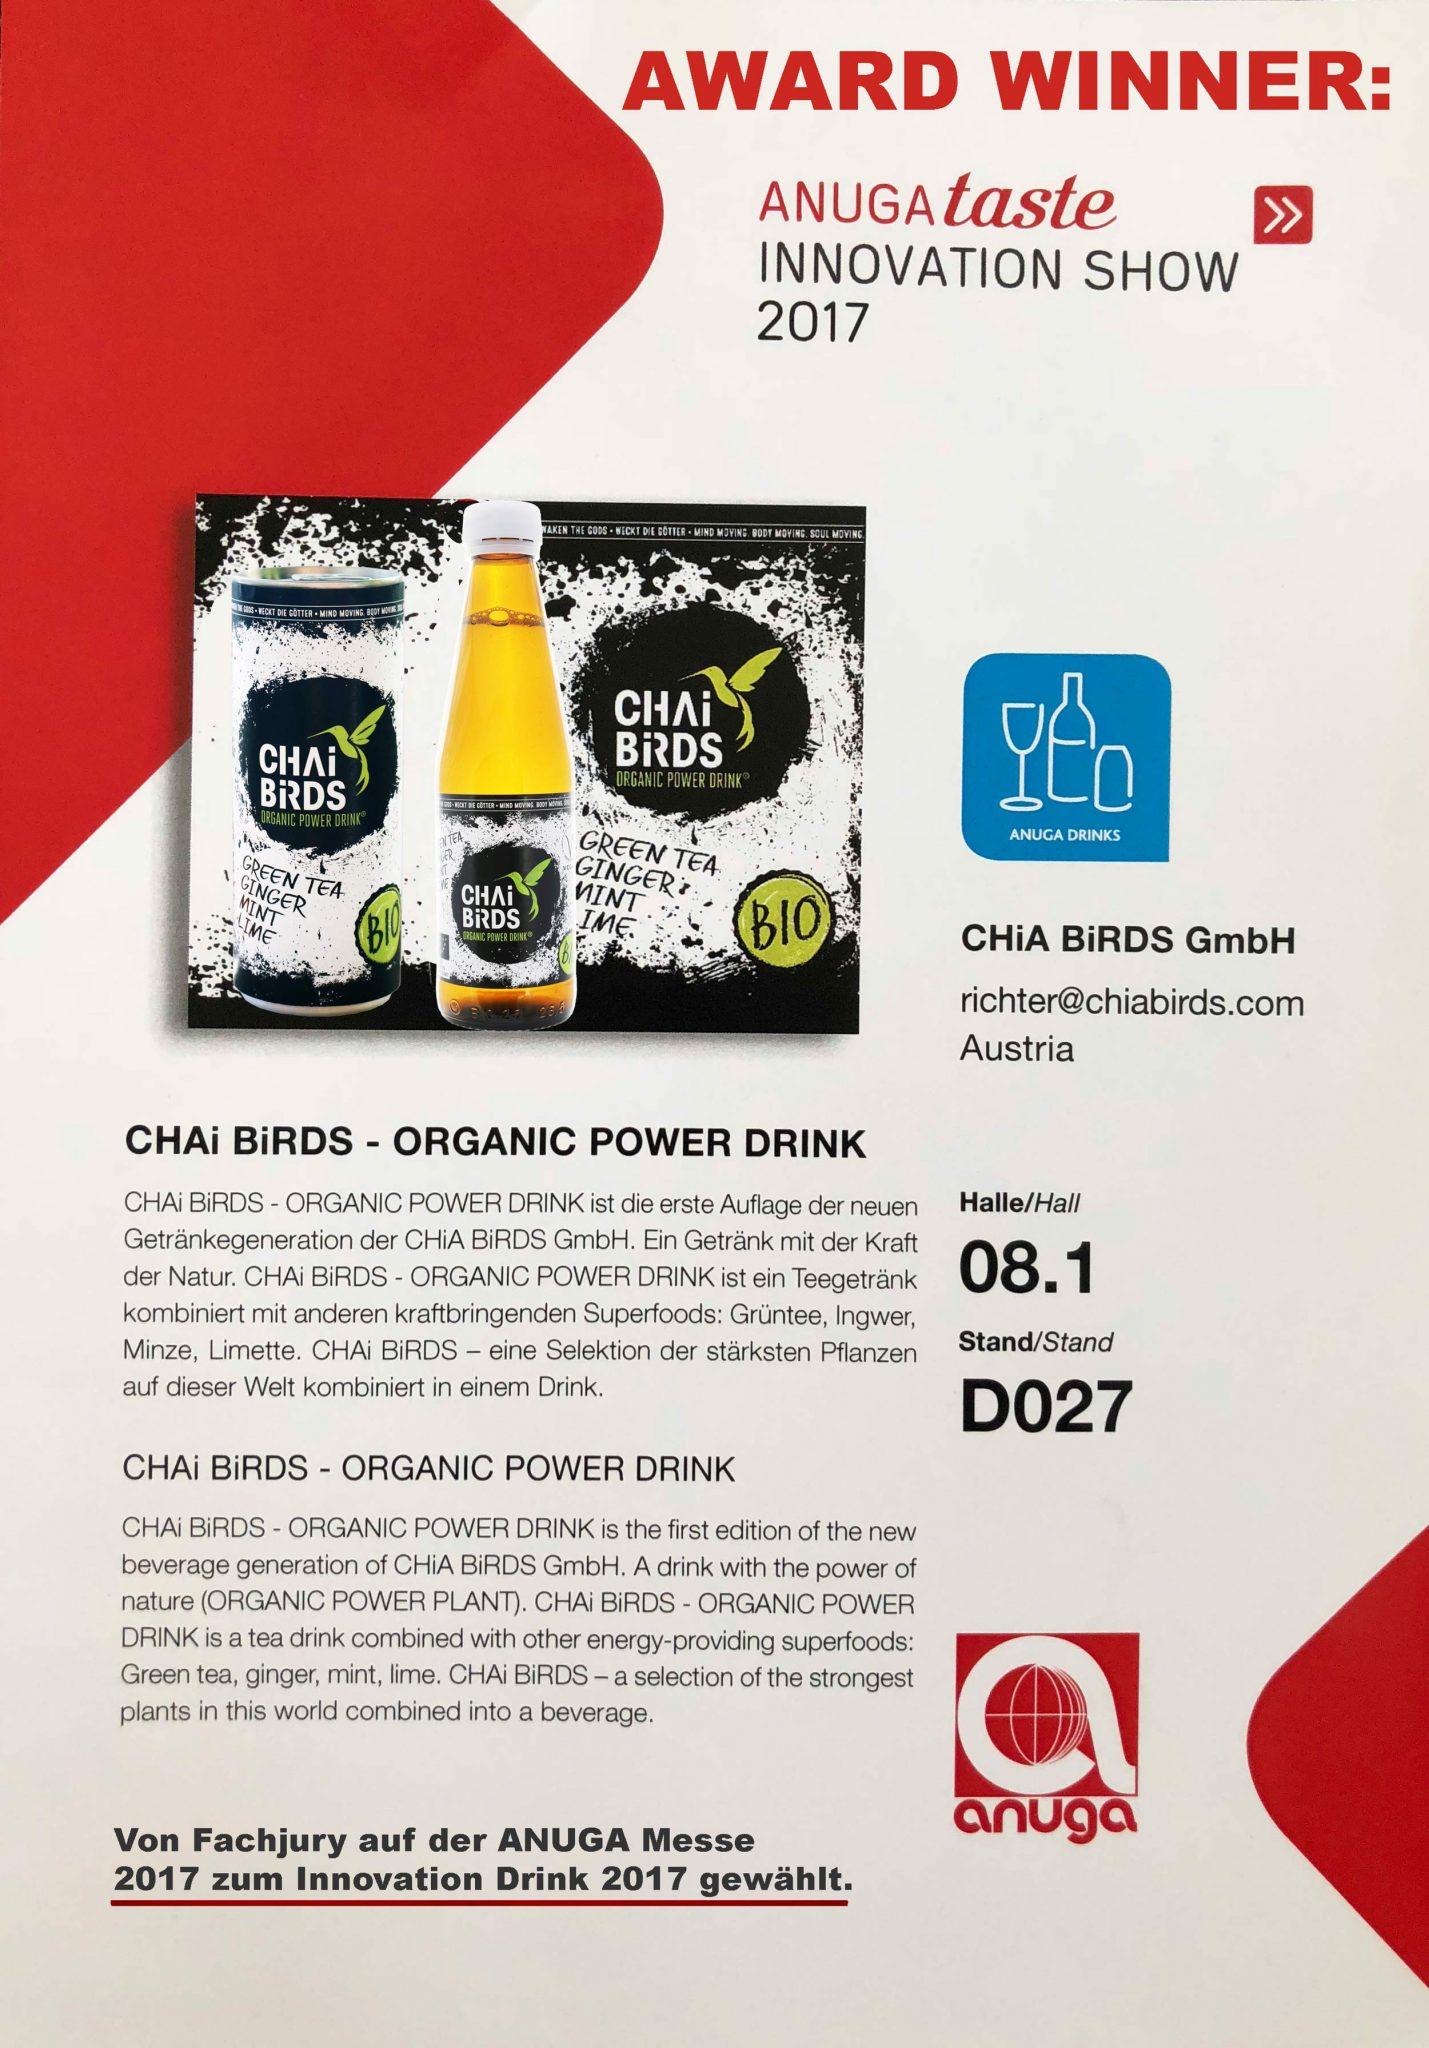 Presse - ORGANIC POWER DRINK - CHiA BiRDS | CHAi BiRDS